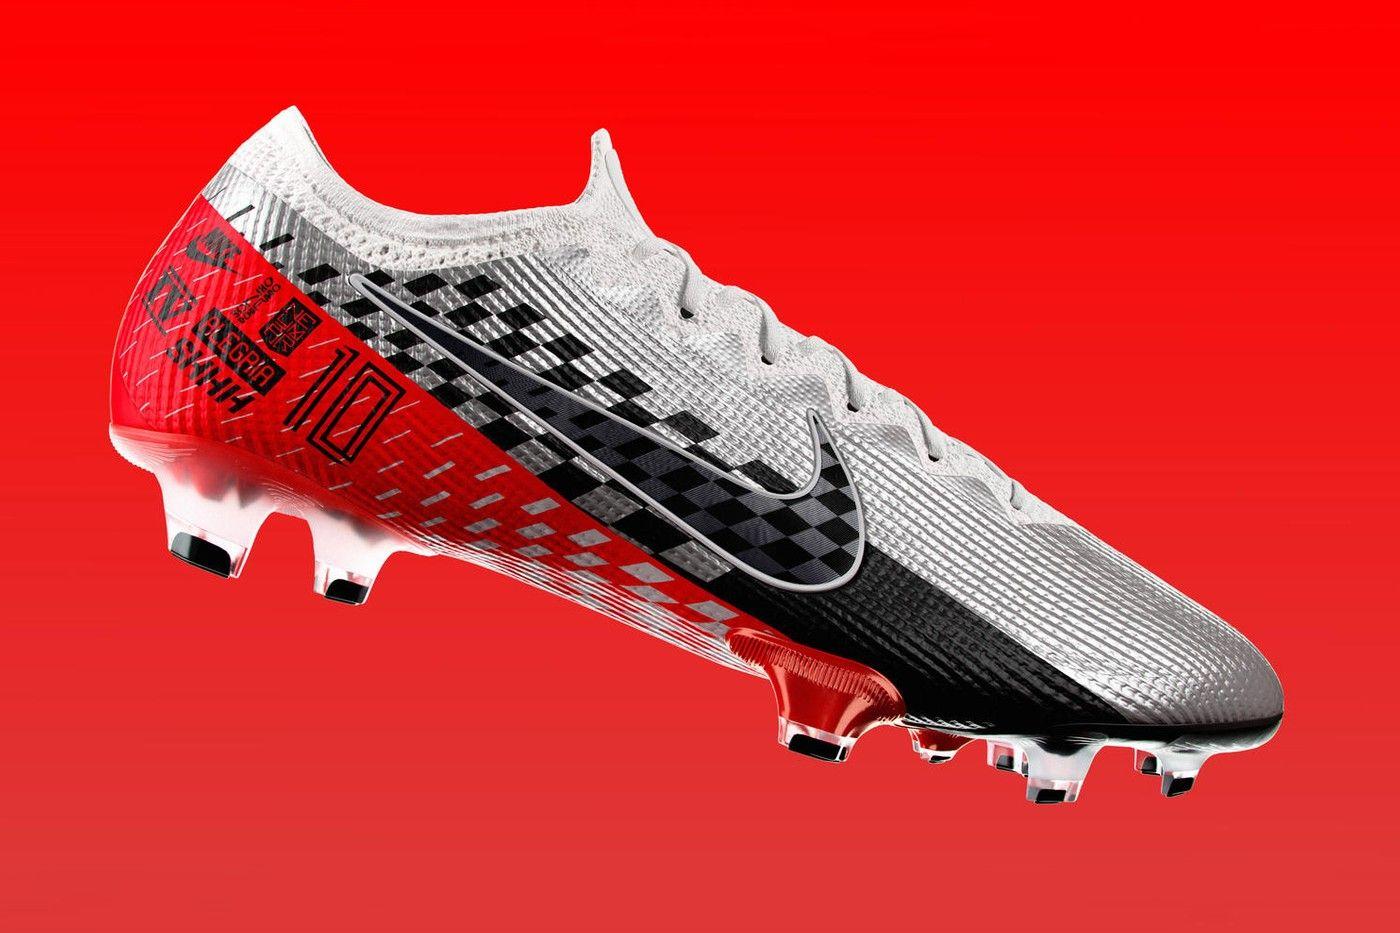 Luminancia abrazo estrategia  Neymar Jr. & Nike Launch Mercurial Vapor 360